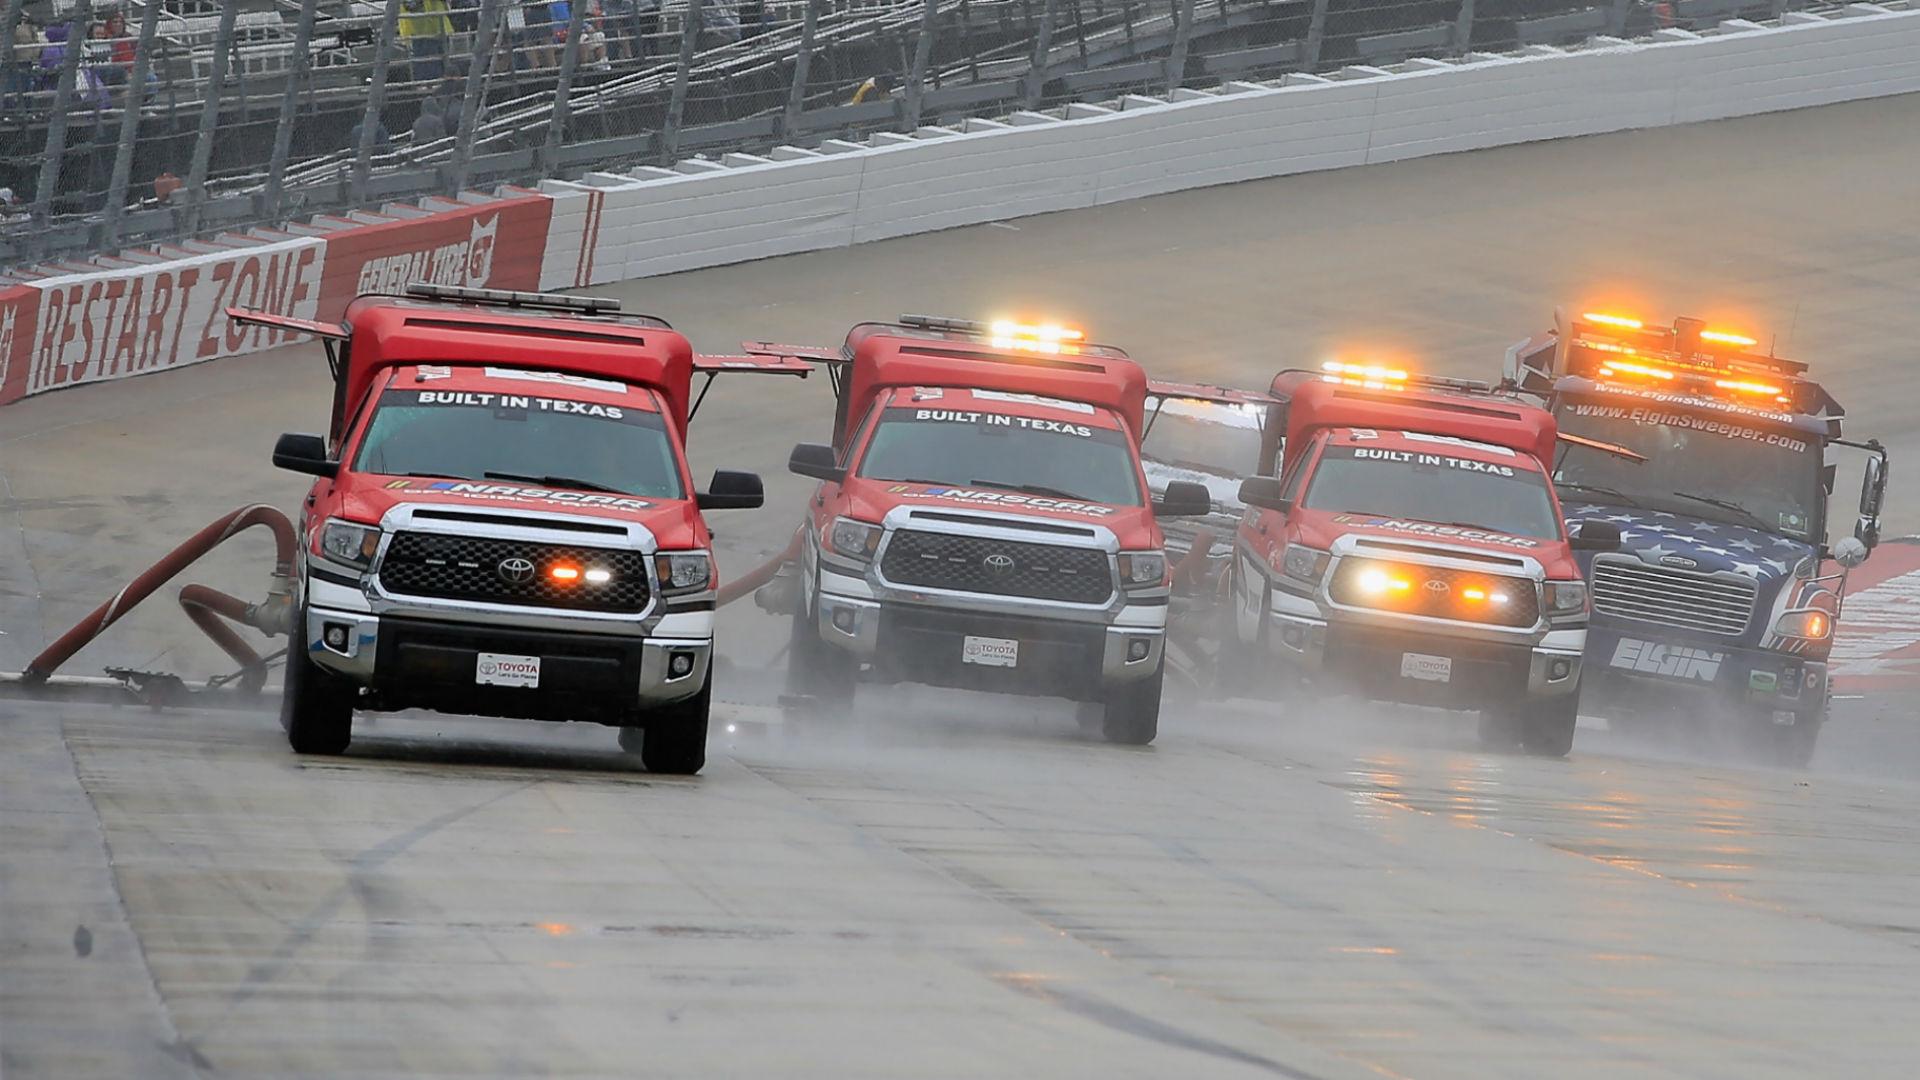 NASCAR race weather updates: Will rain in forecast delay the Pocono race? 1